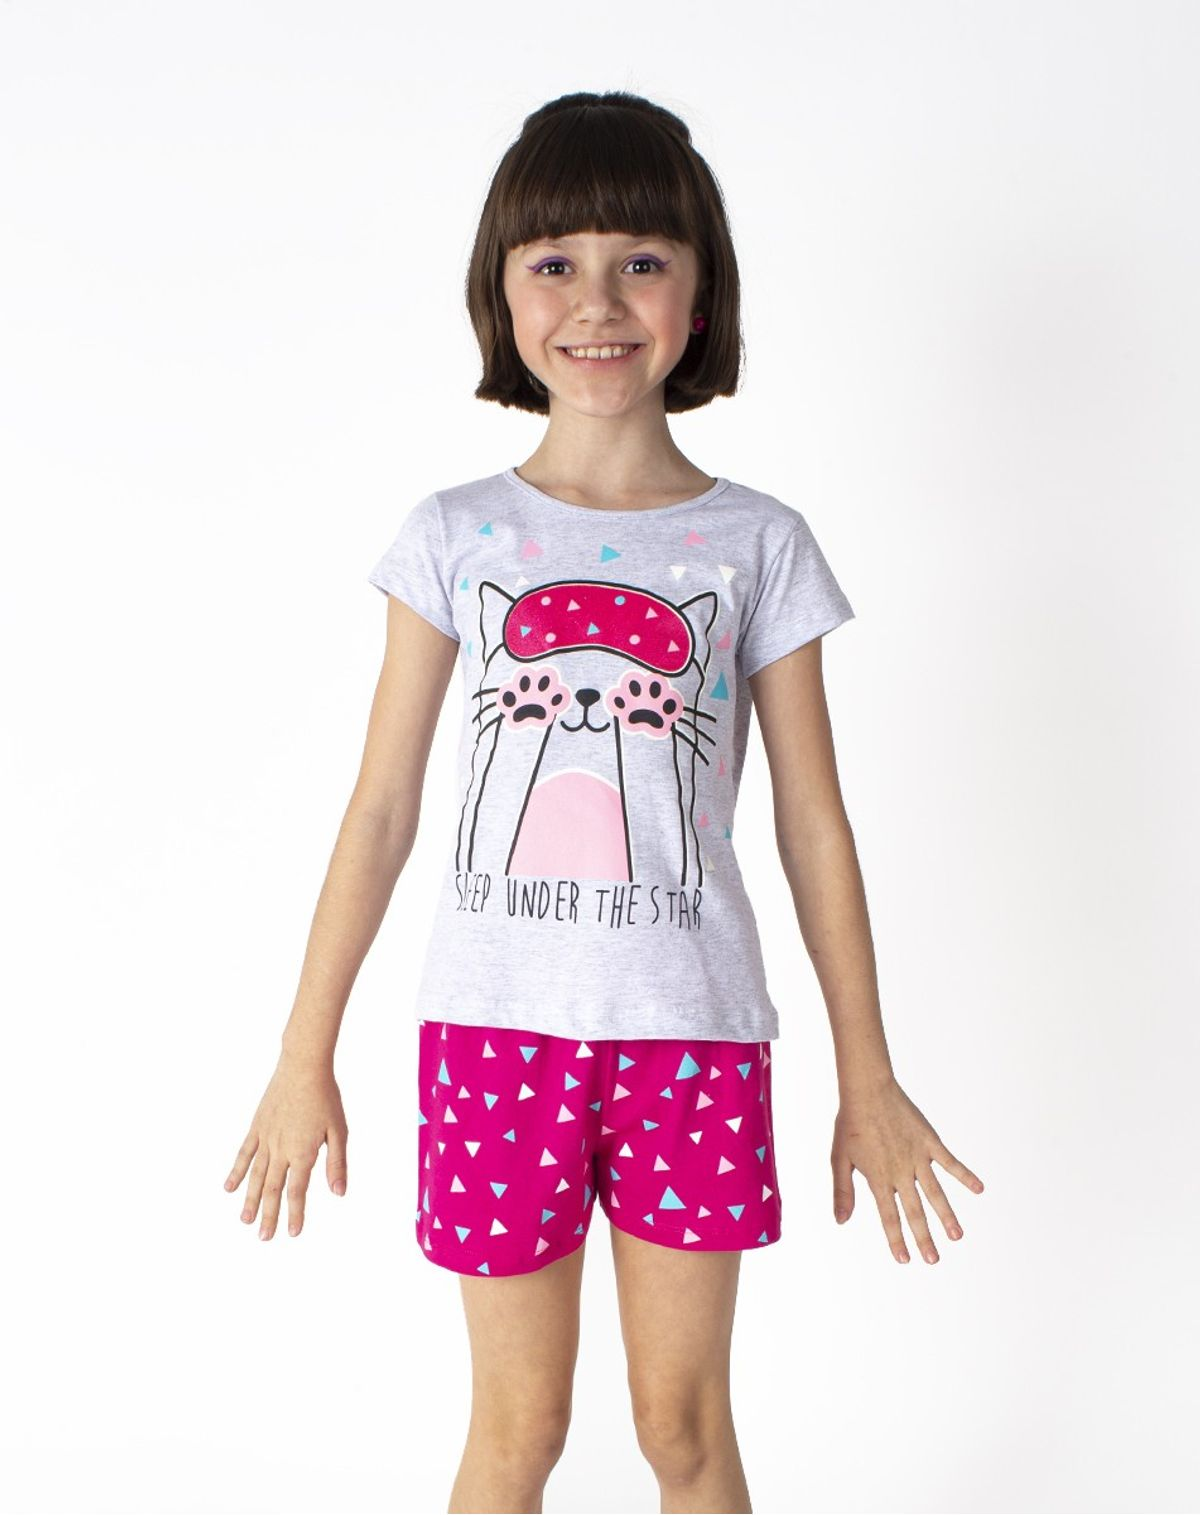 2050005788784-Pijama-Curto-Infantil-Menina-Estampa-Gatinho-Brilha-no-Escuro-MESCLA-CLARO-4-1